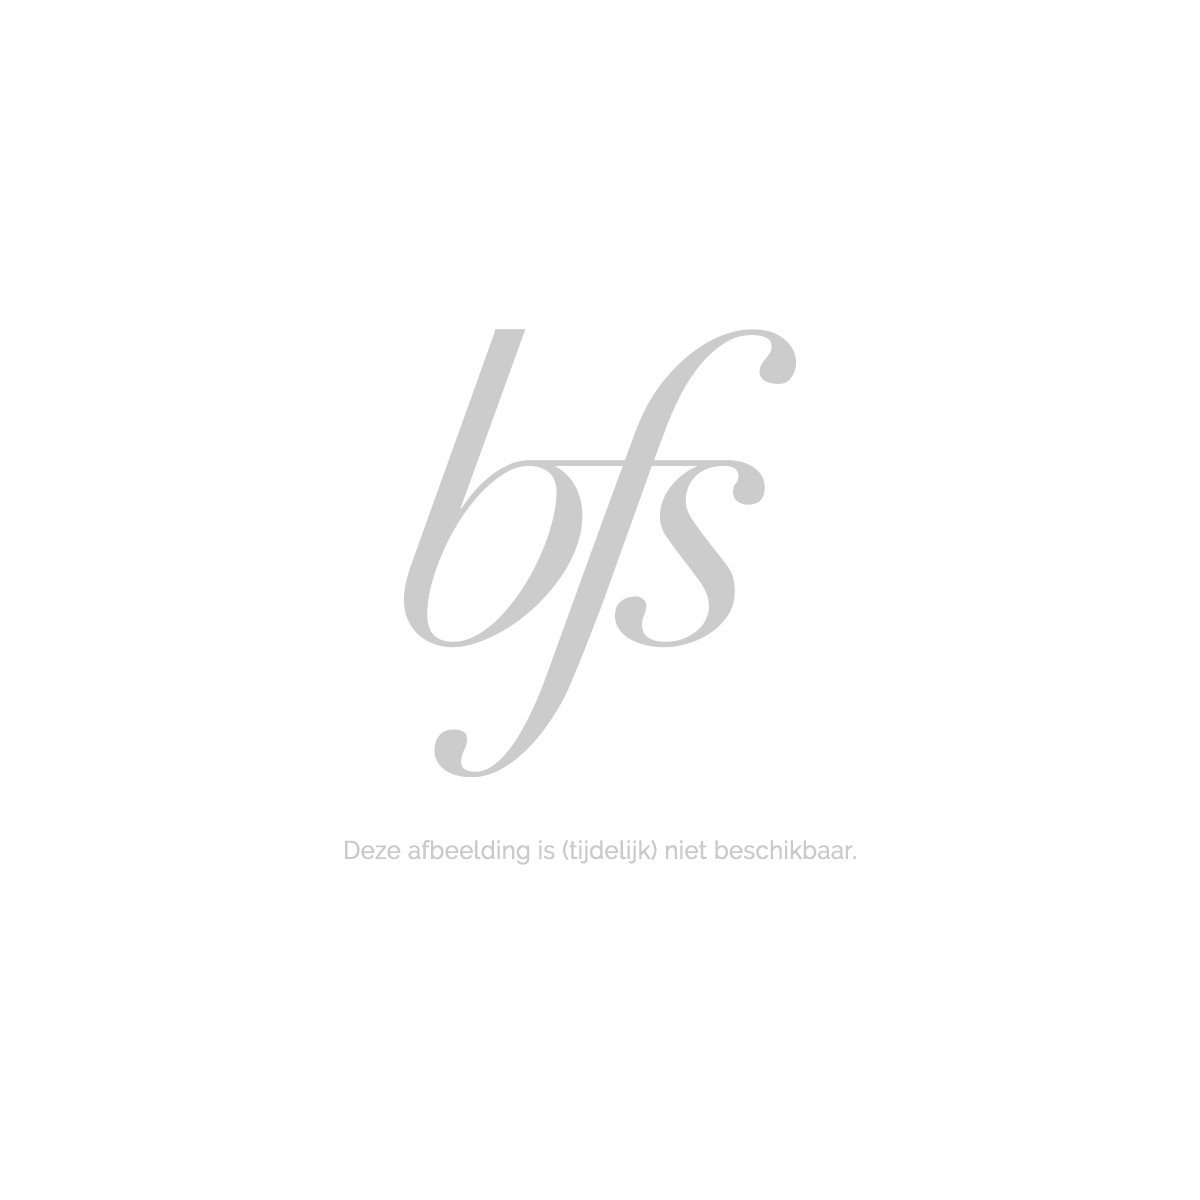 Hildegard Braukmann Sun and Care Aloe Vera Körperlotion SPF 50